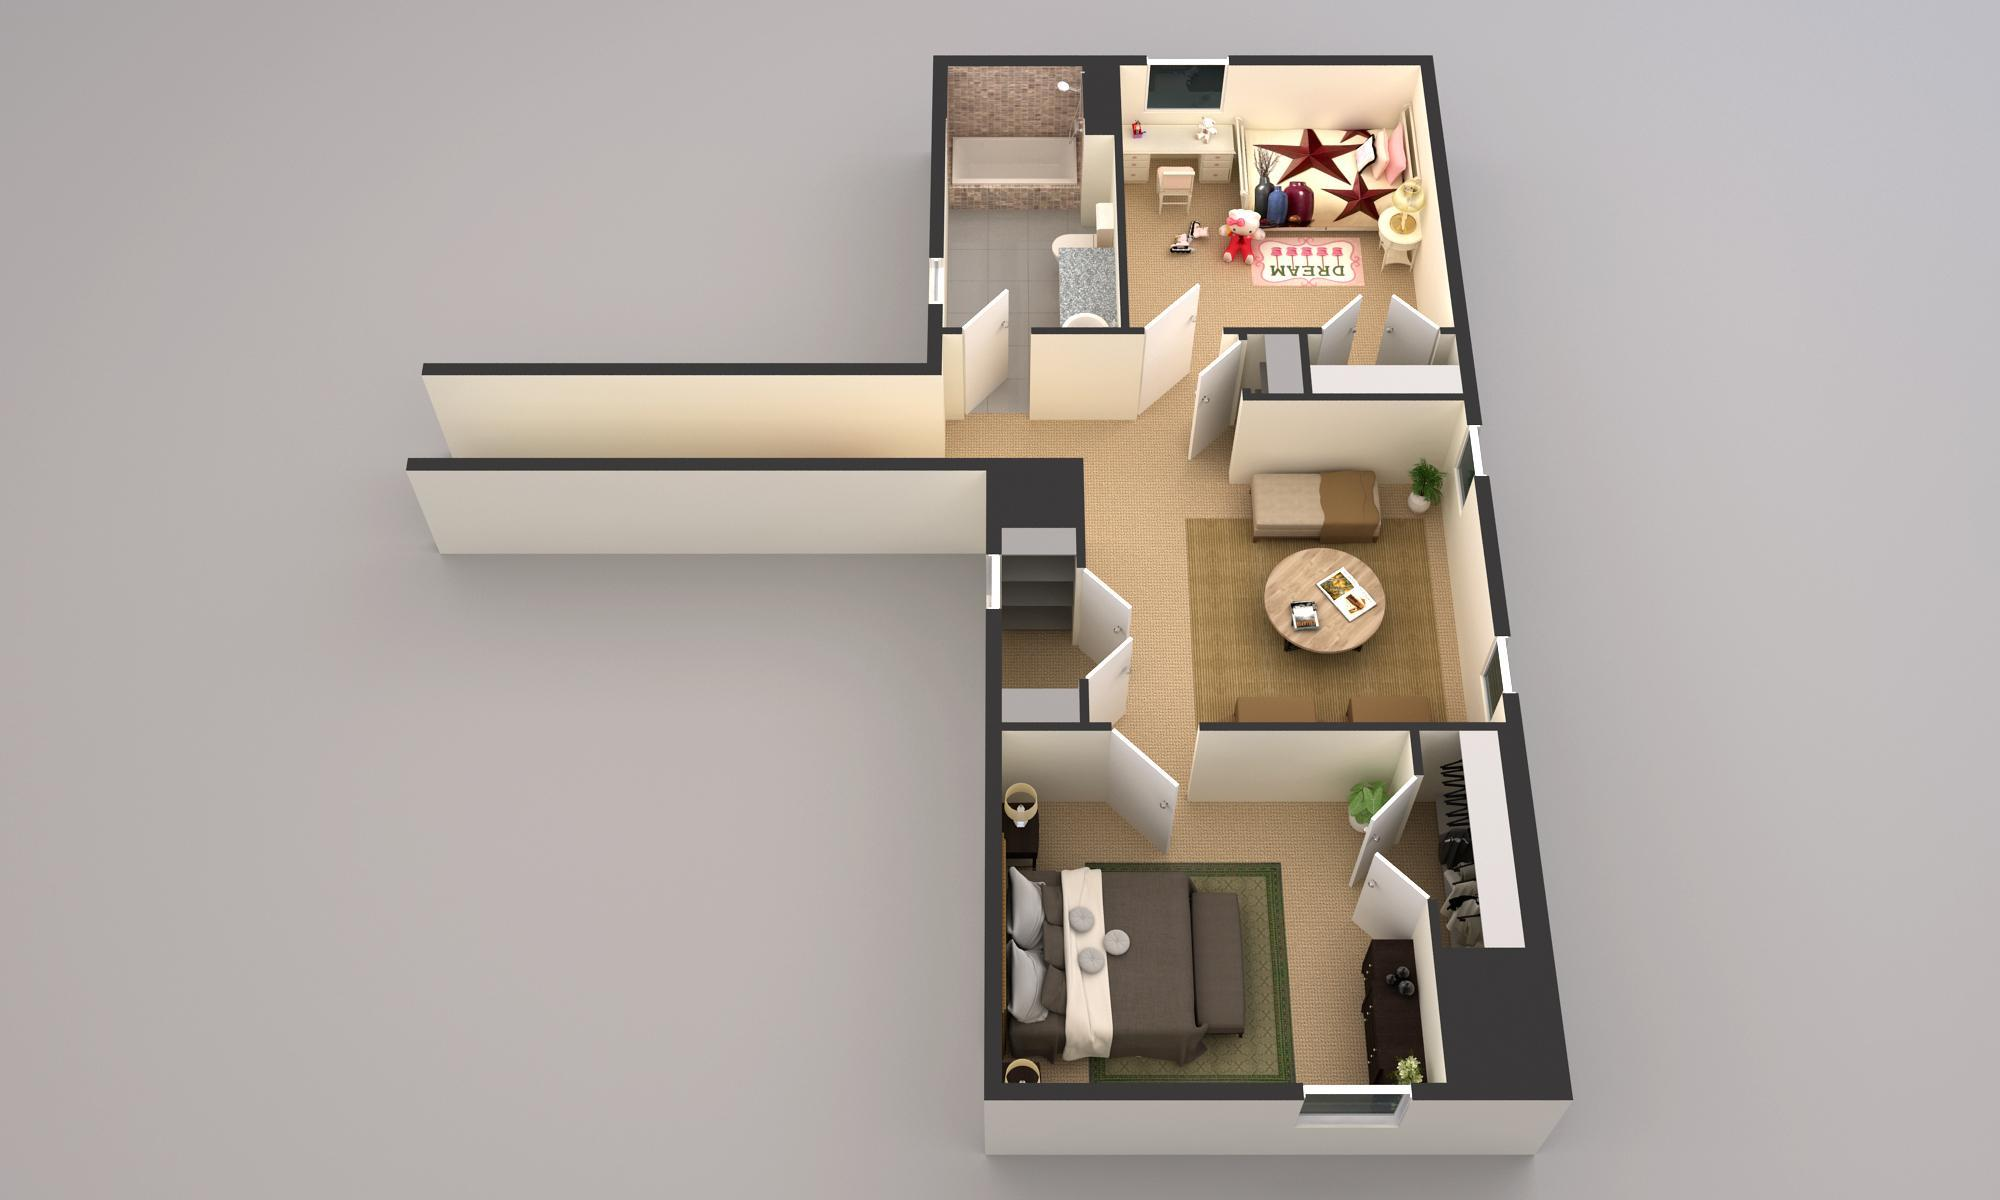 http://partners-dynamic.bdxcdn.com/Images/Homes/GoodallHomebuilder/max1500_27738859-180524.jpg